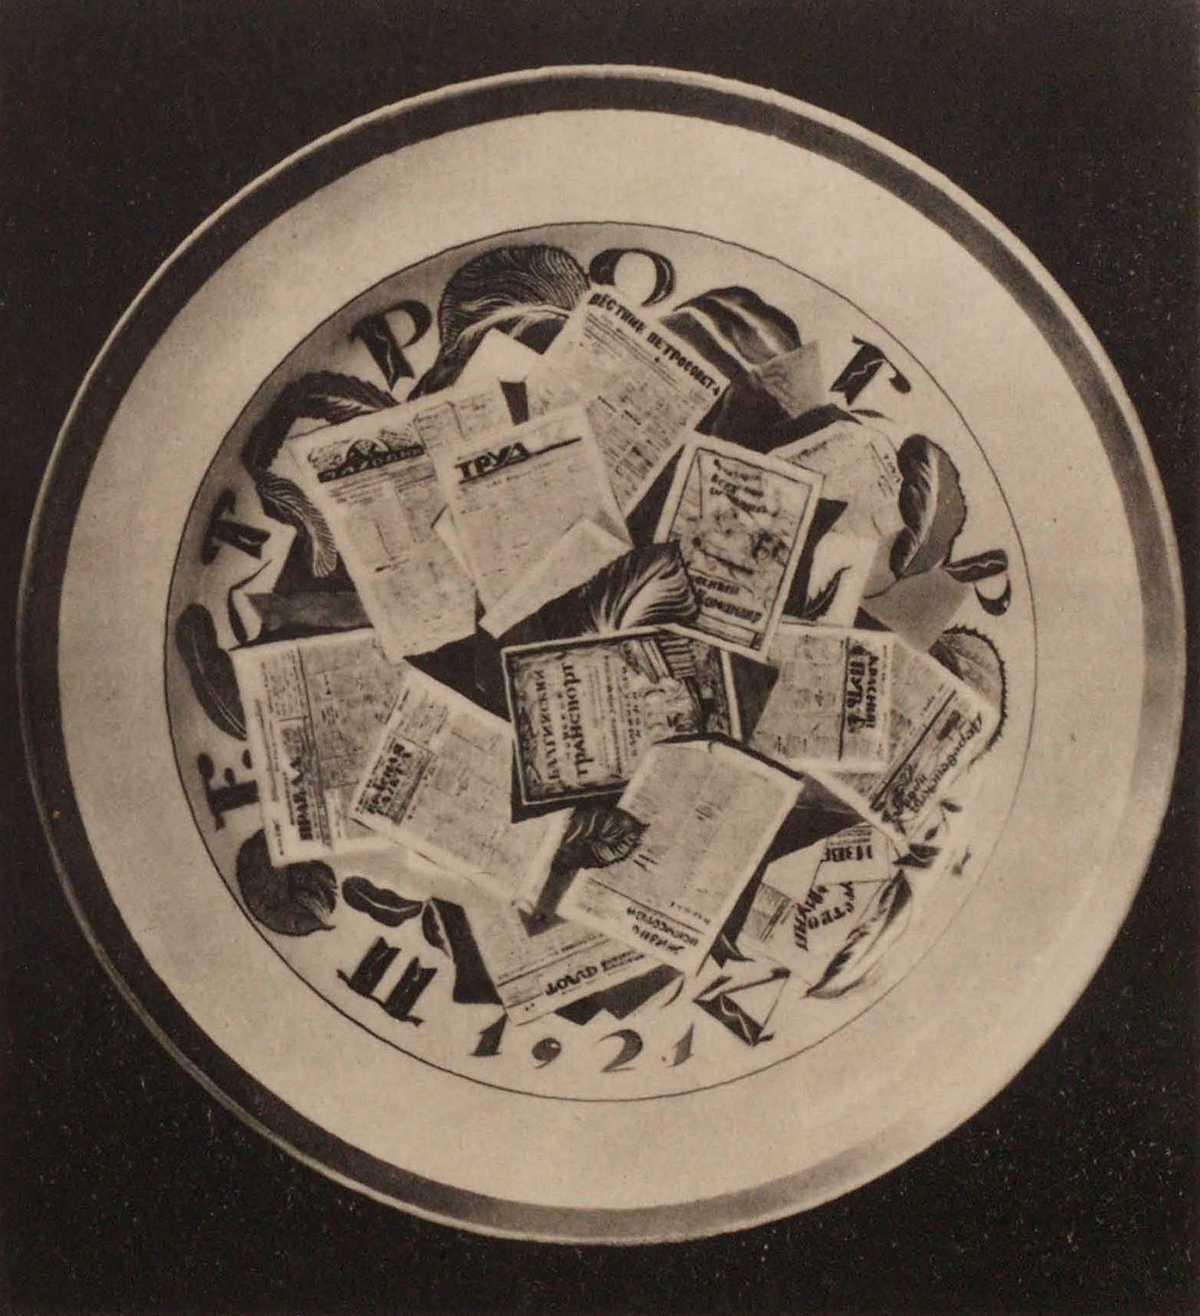 э ф голлербах сюжеты и характер живописи по фарфору 1924